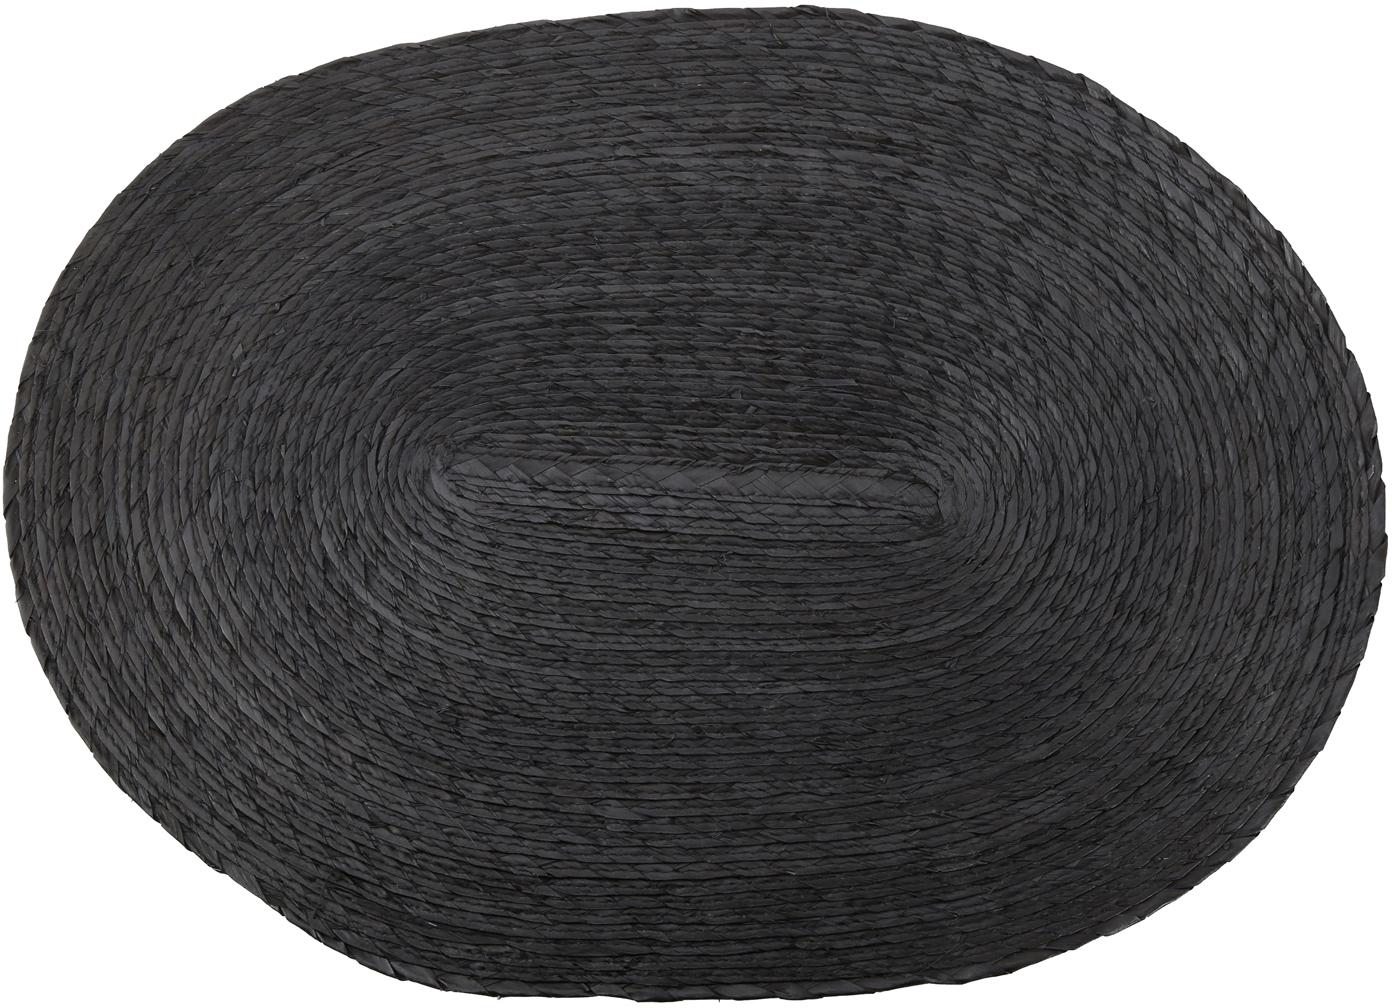 Tovaglietta americana Mineola 2 pz, Foglie di palma, Nero, Larg. 33 x Lung. 46 cm